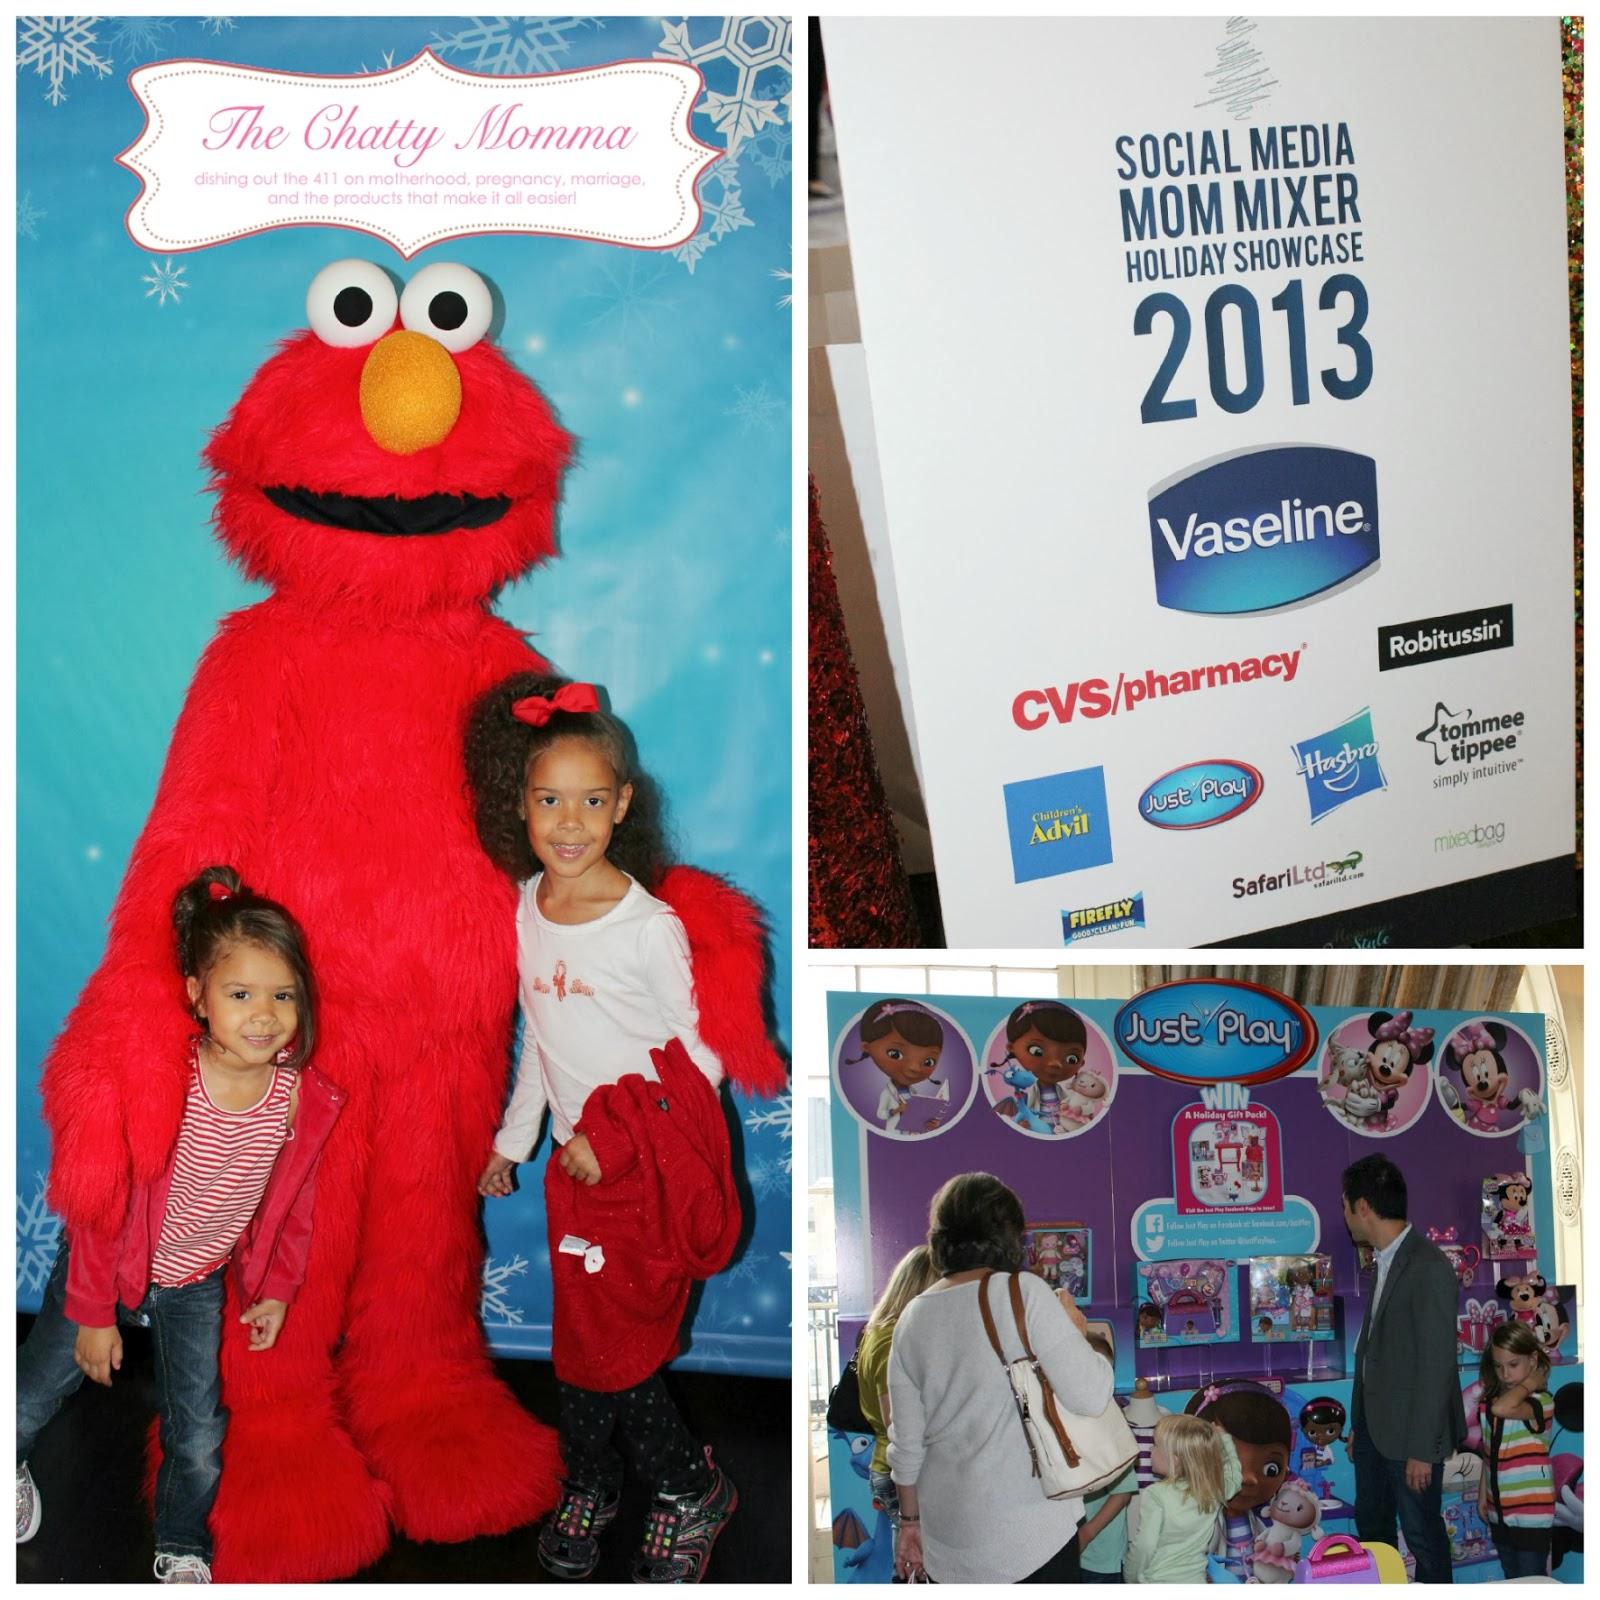 Social Media #MomMixer Holiday Showcase 2013 RECAP -Part 1